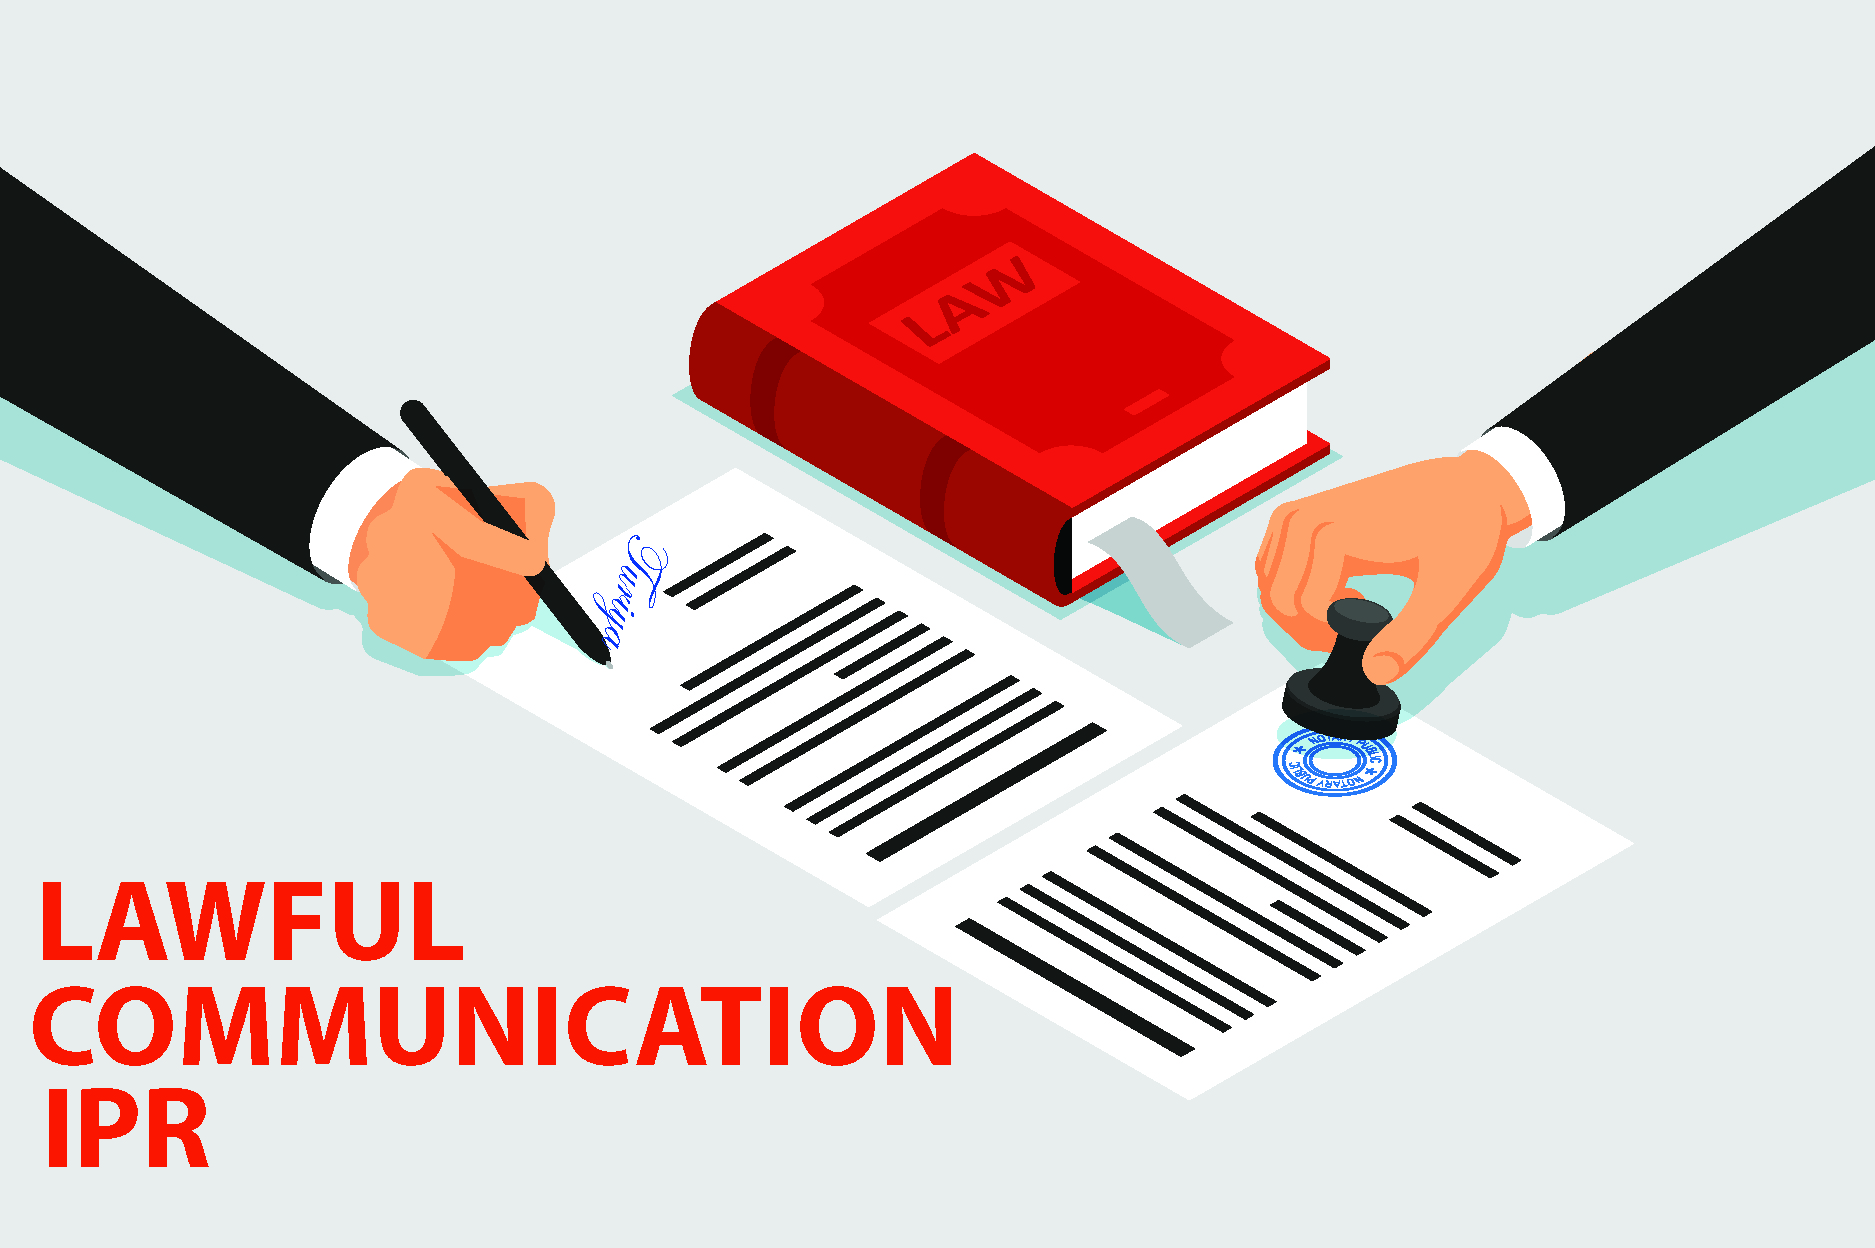 Lawful Communication